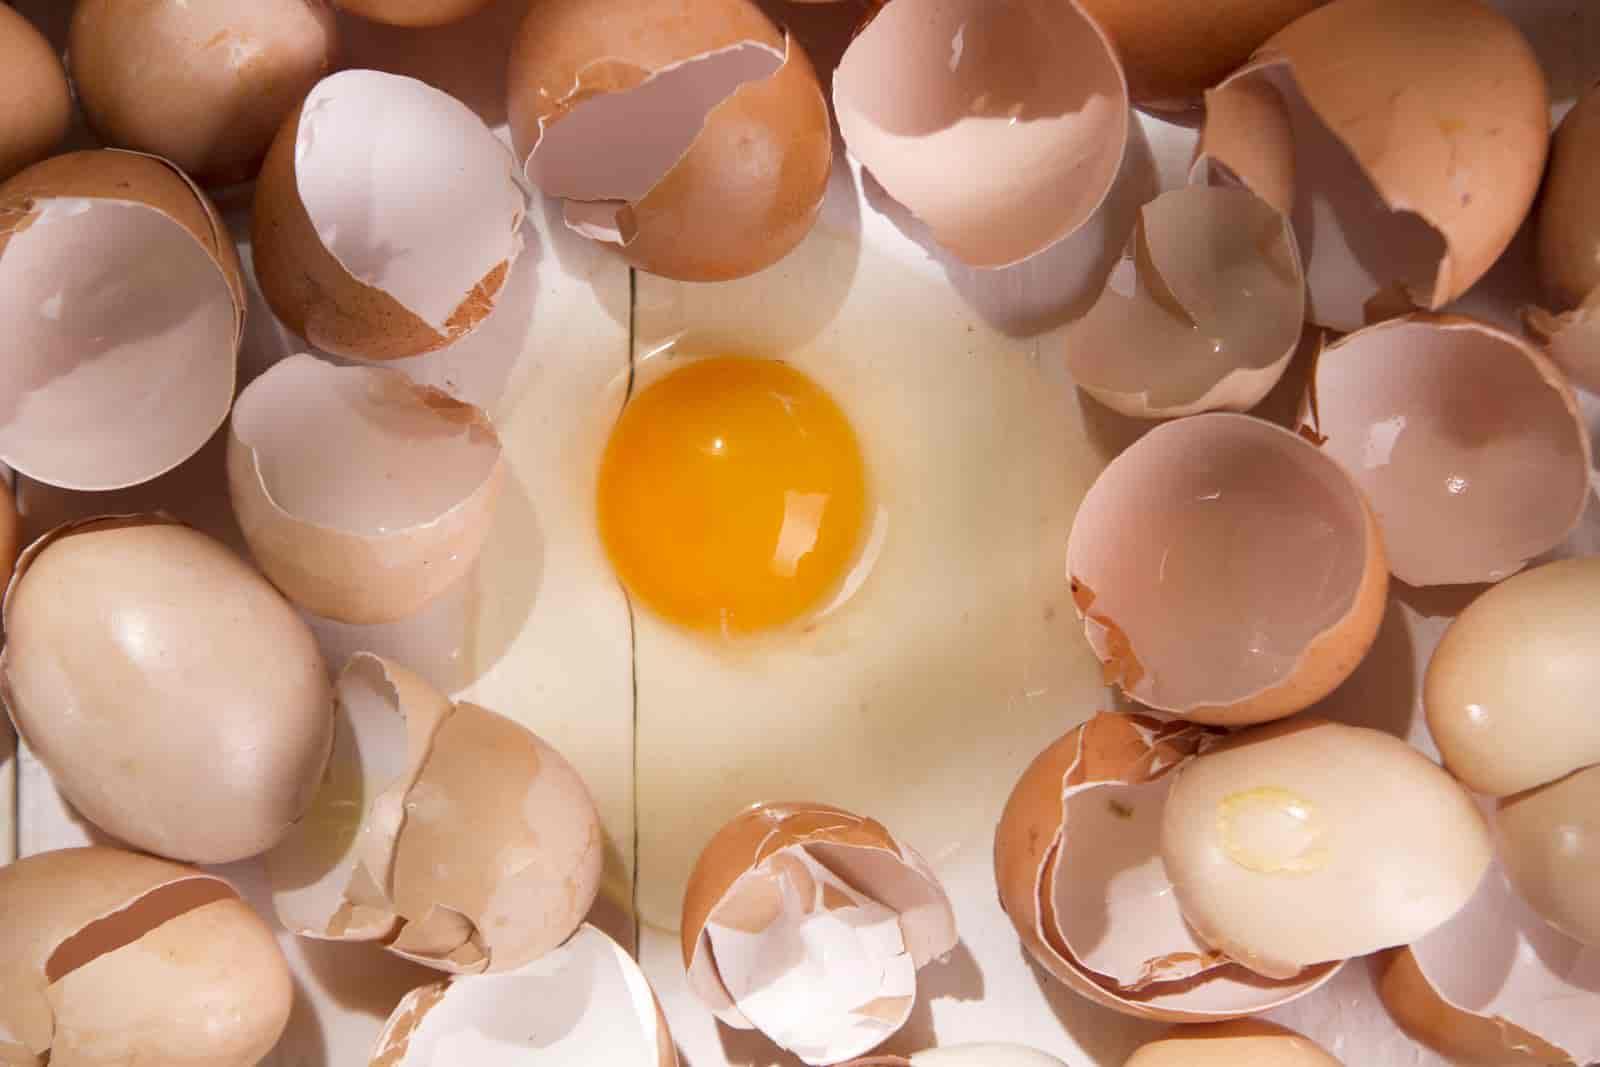 do pothos like eggshells